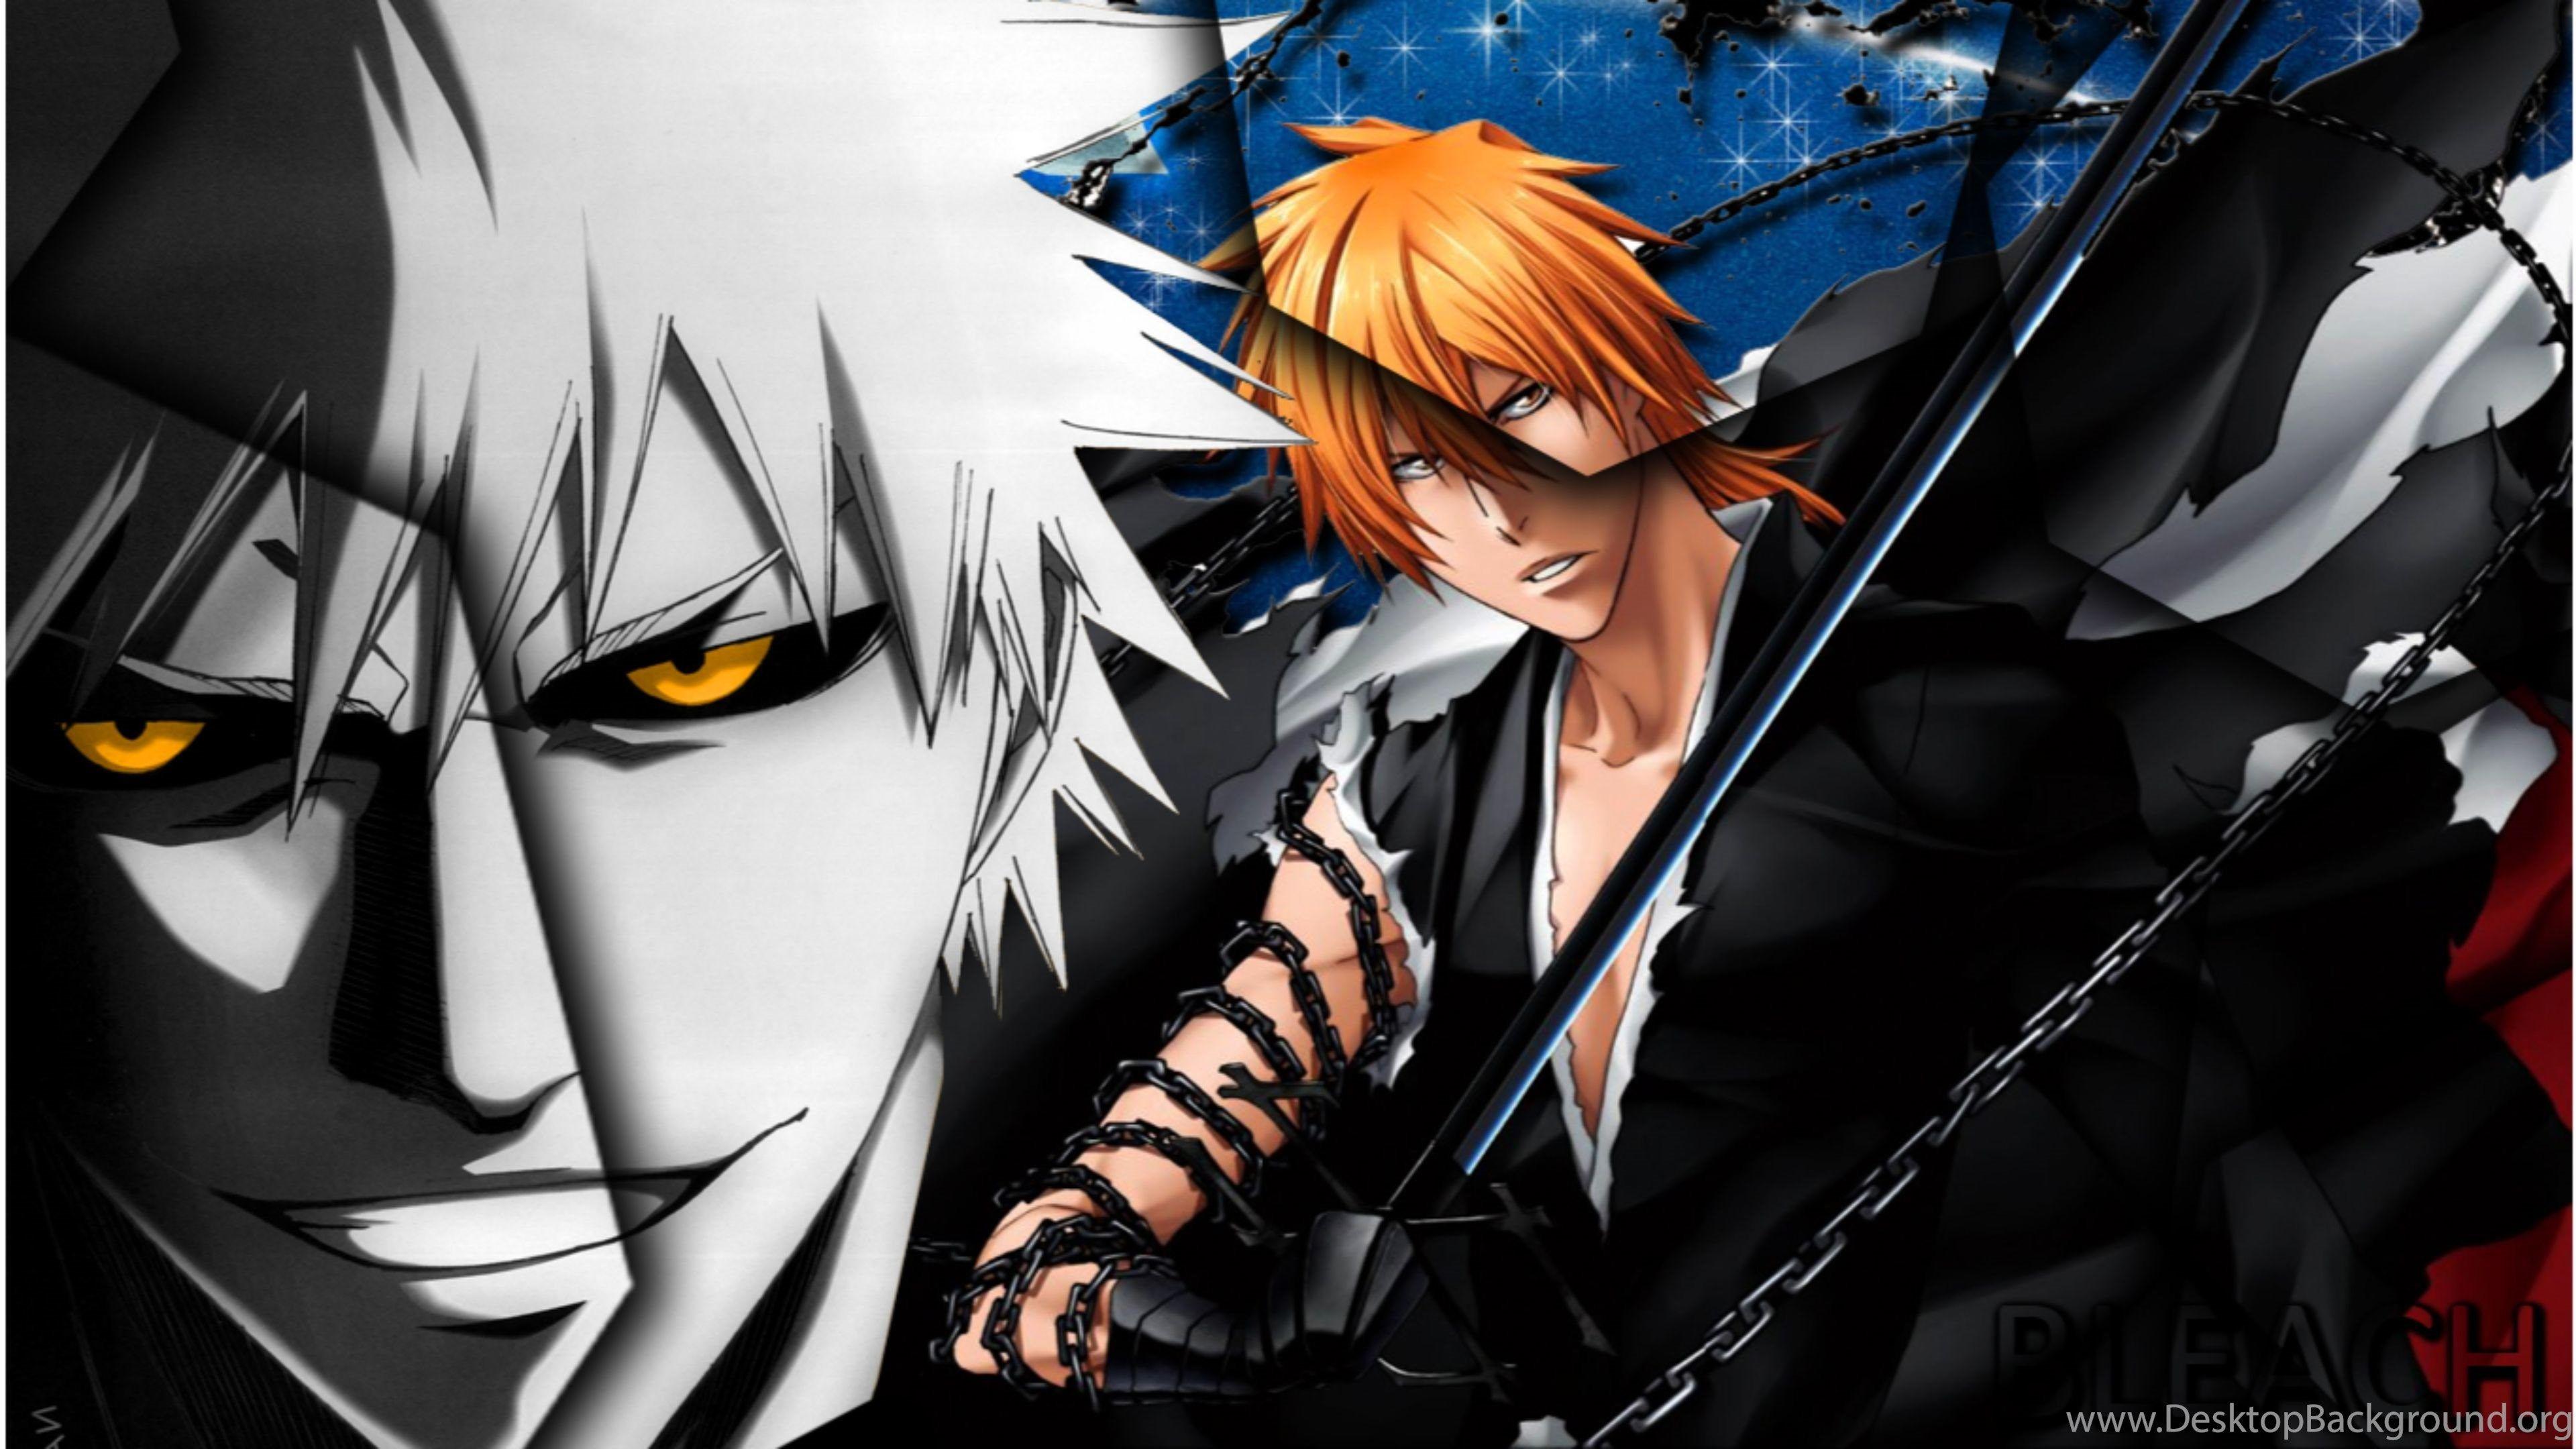 Ultra Hd Anime Wallpaper 4k Free 2016 4k Anime Wallpapers